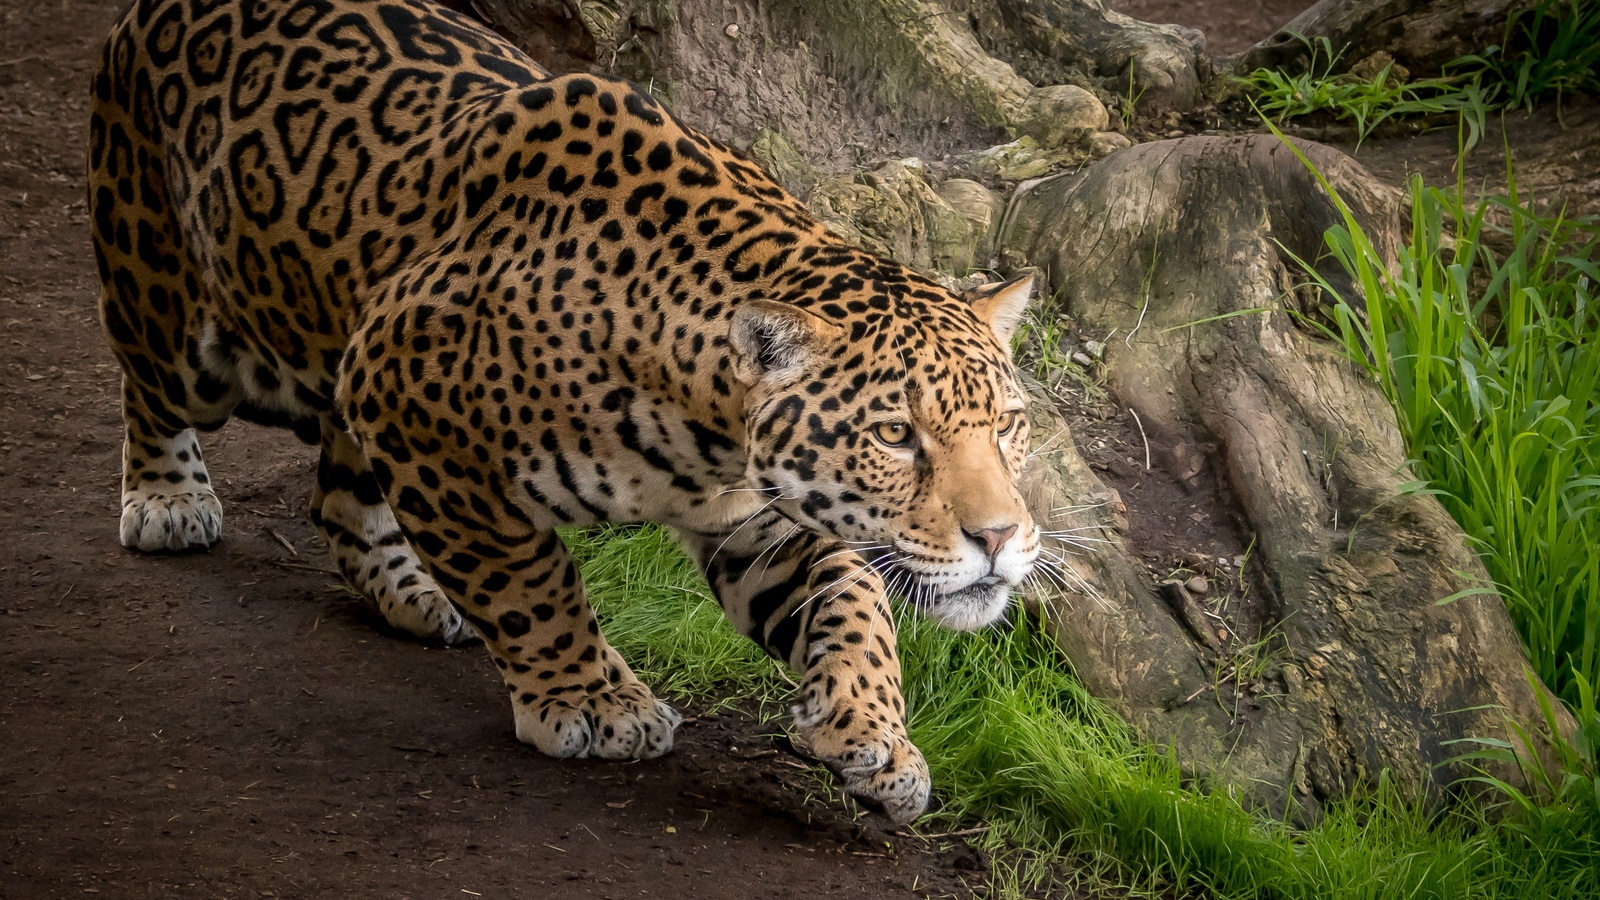 Wallpaper Cheetah Pair Hd Animals 6057: 1600x900 Jaguar Animal 1600x900 Resolution HD 4k